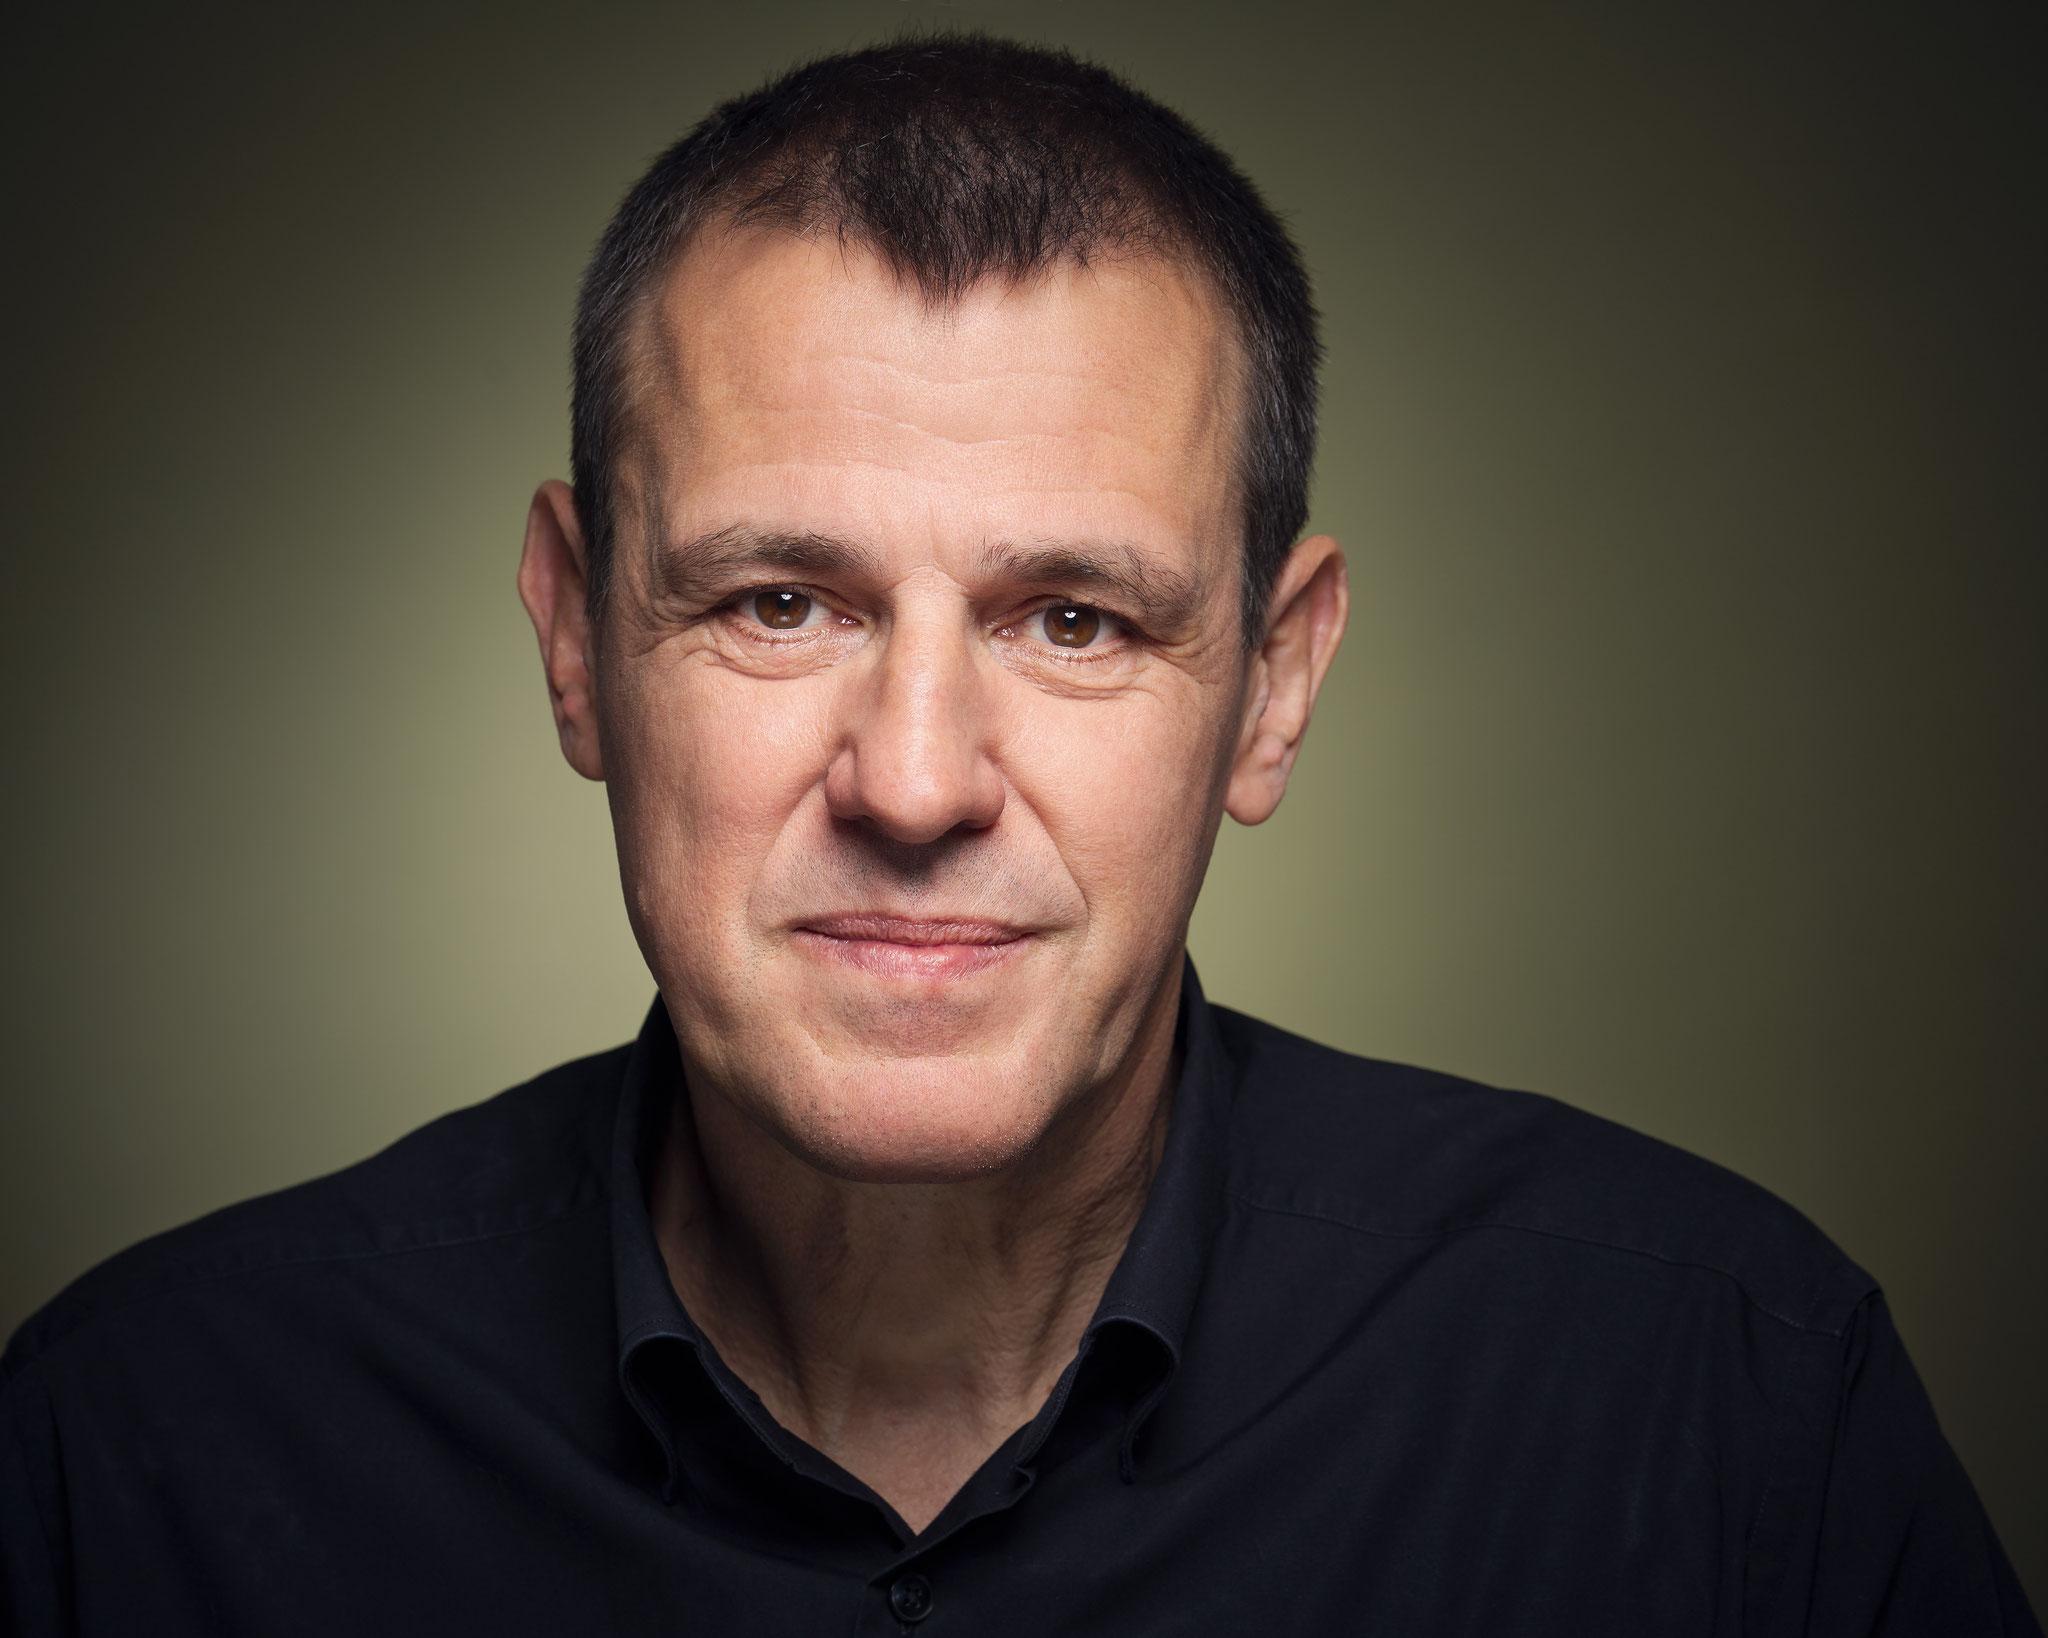 Hartmut SCHÖRGHOFER, Set Designer